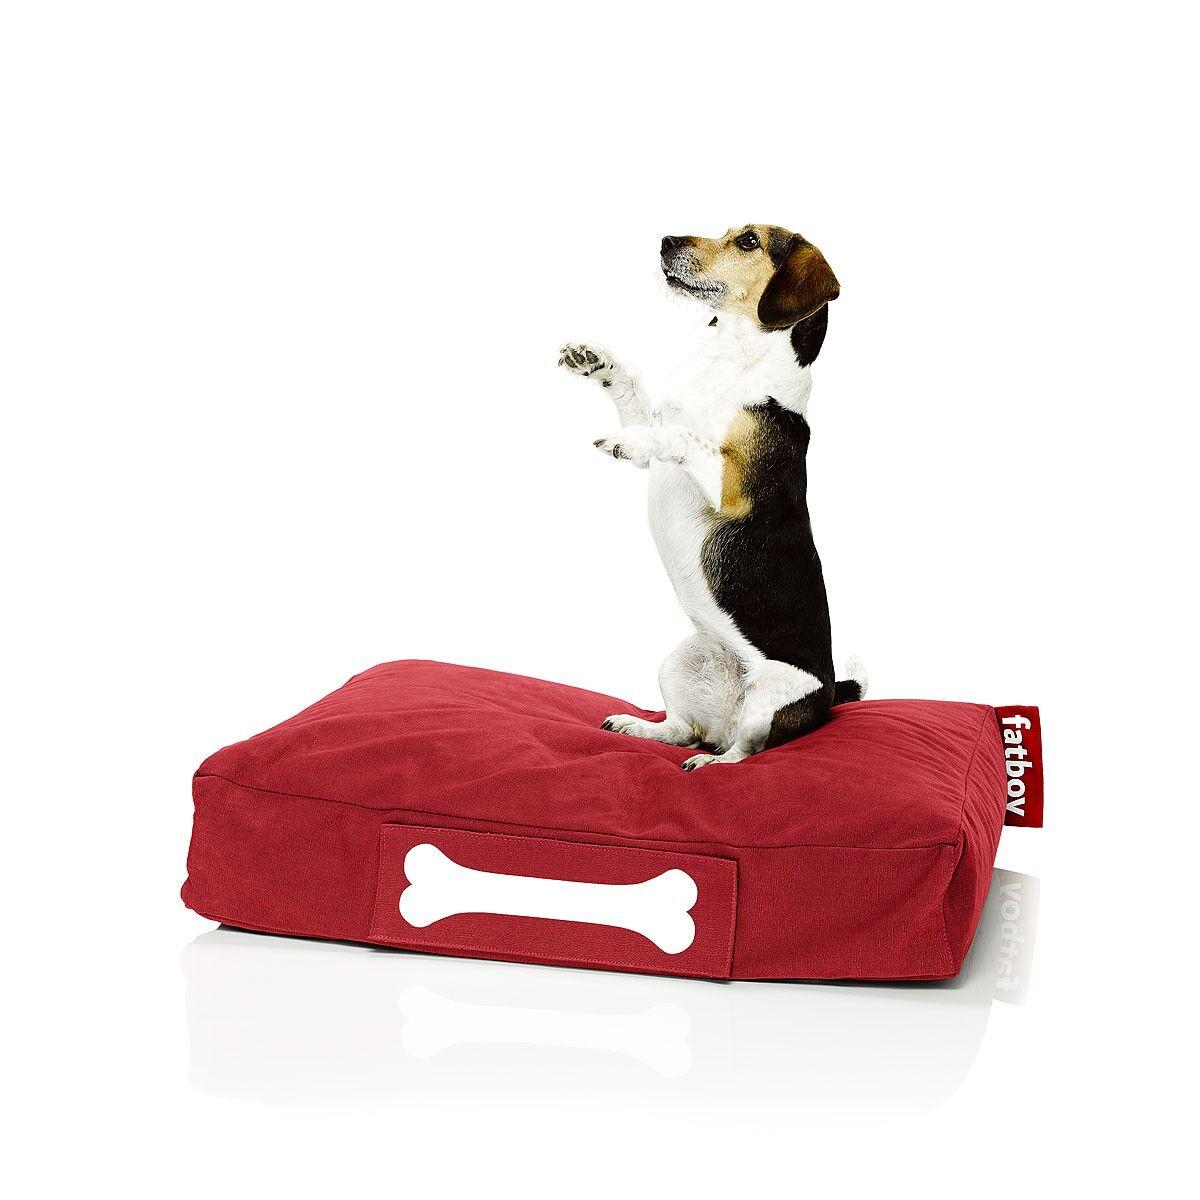 FATBOY sac pouf pour chiens et chats DOGGIELOUNGE STONEWASHED SMALL (Rouge - 100% Coton)